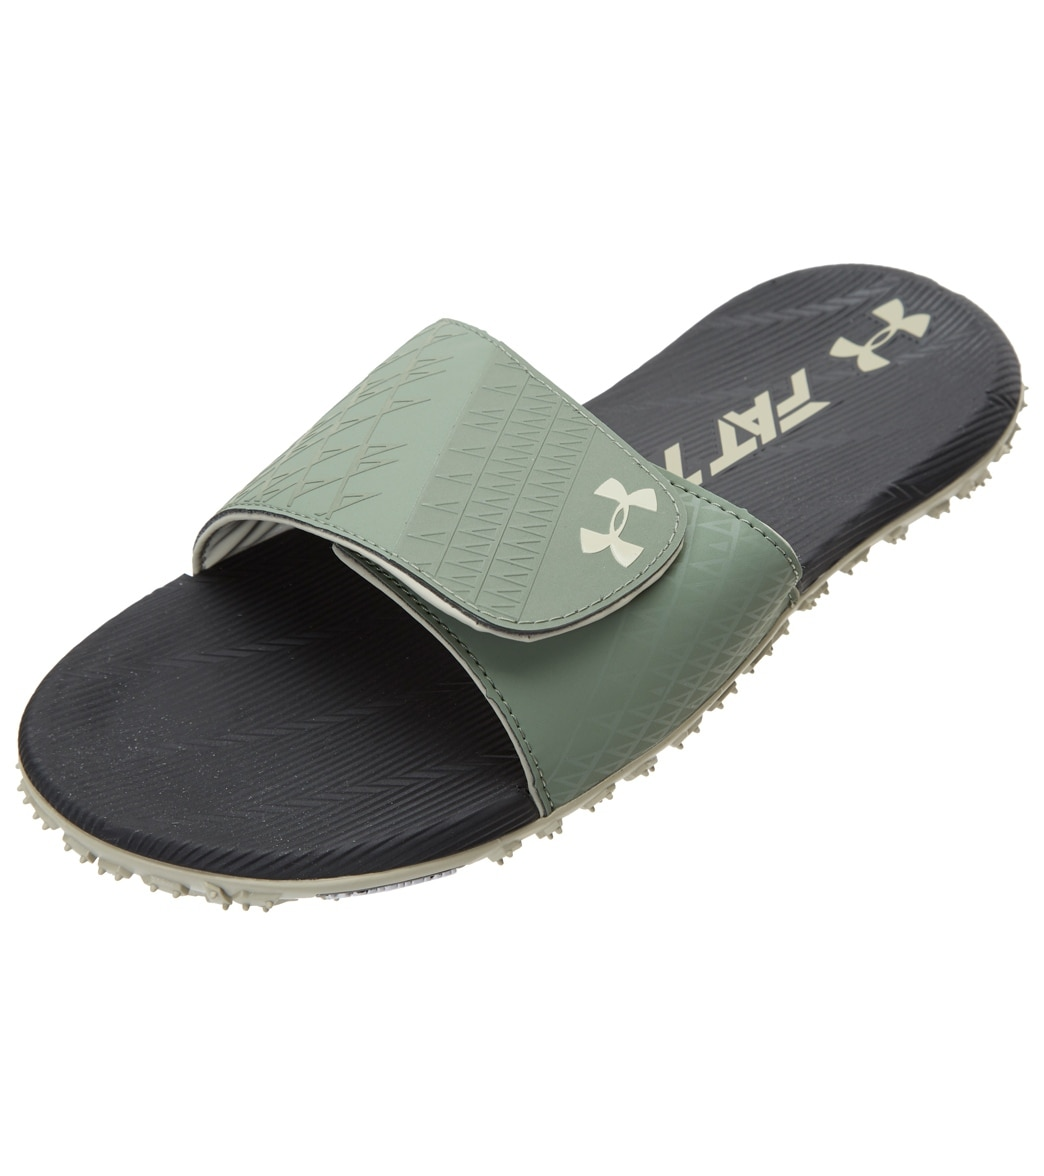 b4ba4218aa9d Under Armour Men s Fat Tire Slide Sandal at SwimOutlet.com - Free Shipping